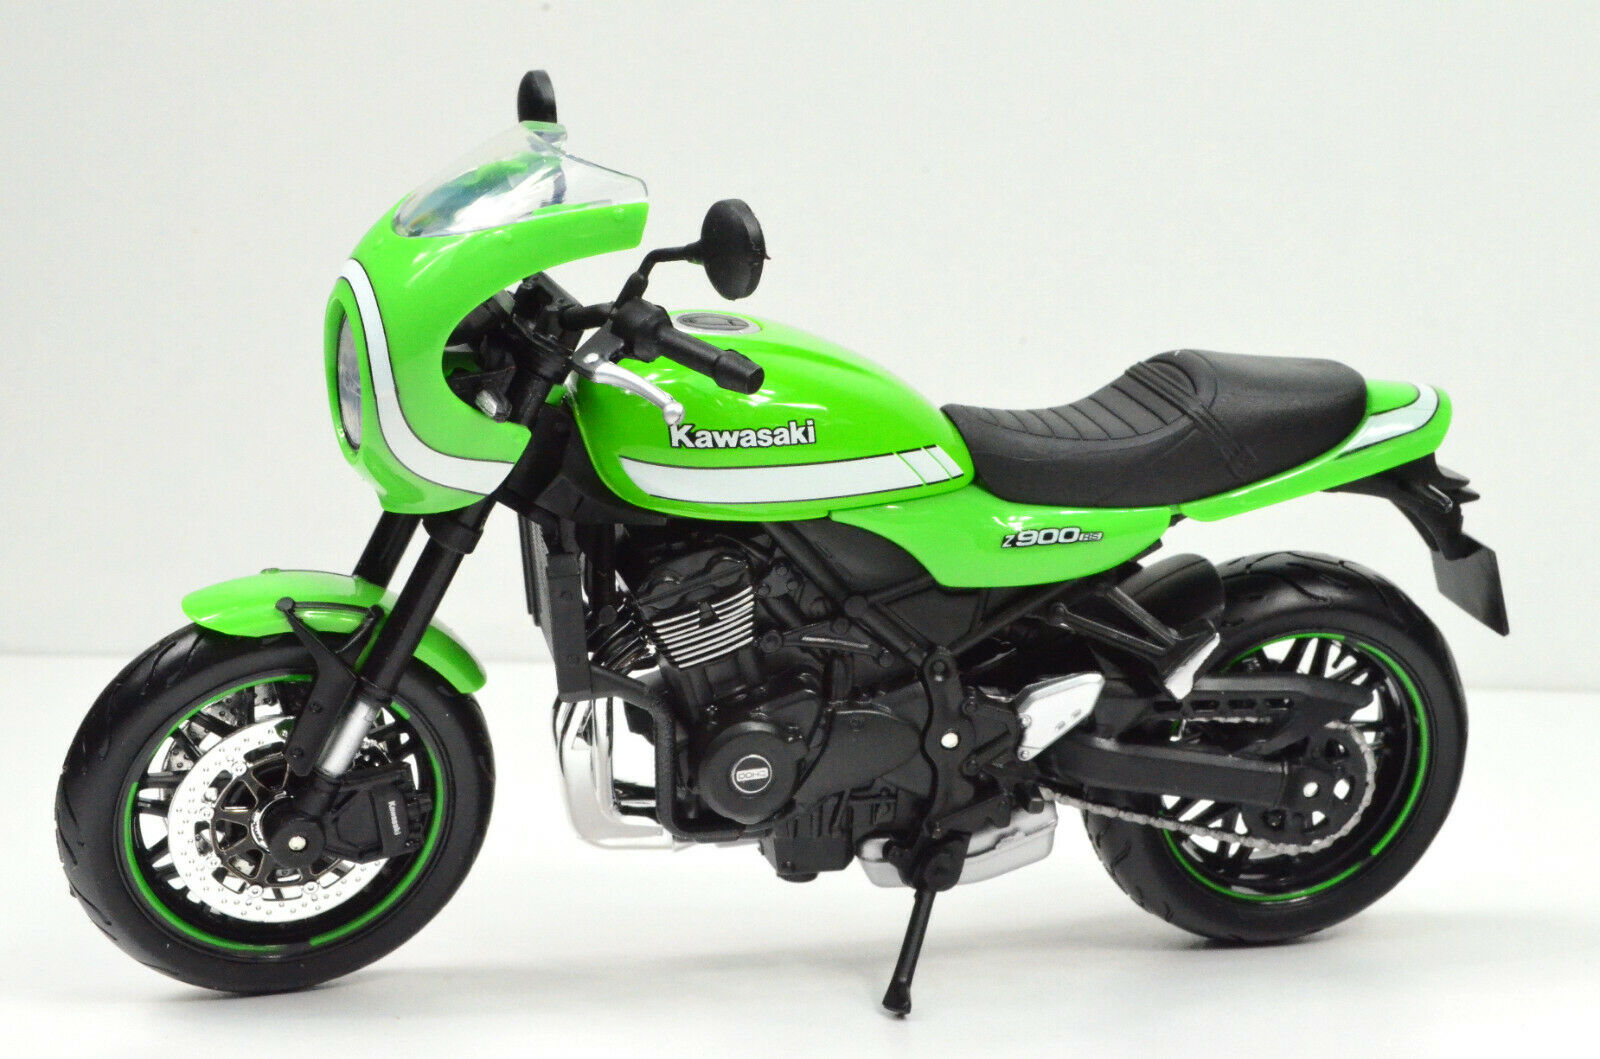 Z 900 RS Maisto Kawasaki Z900RS 1:12 Z 900RS Cafe grün green Z900 RS